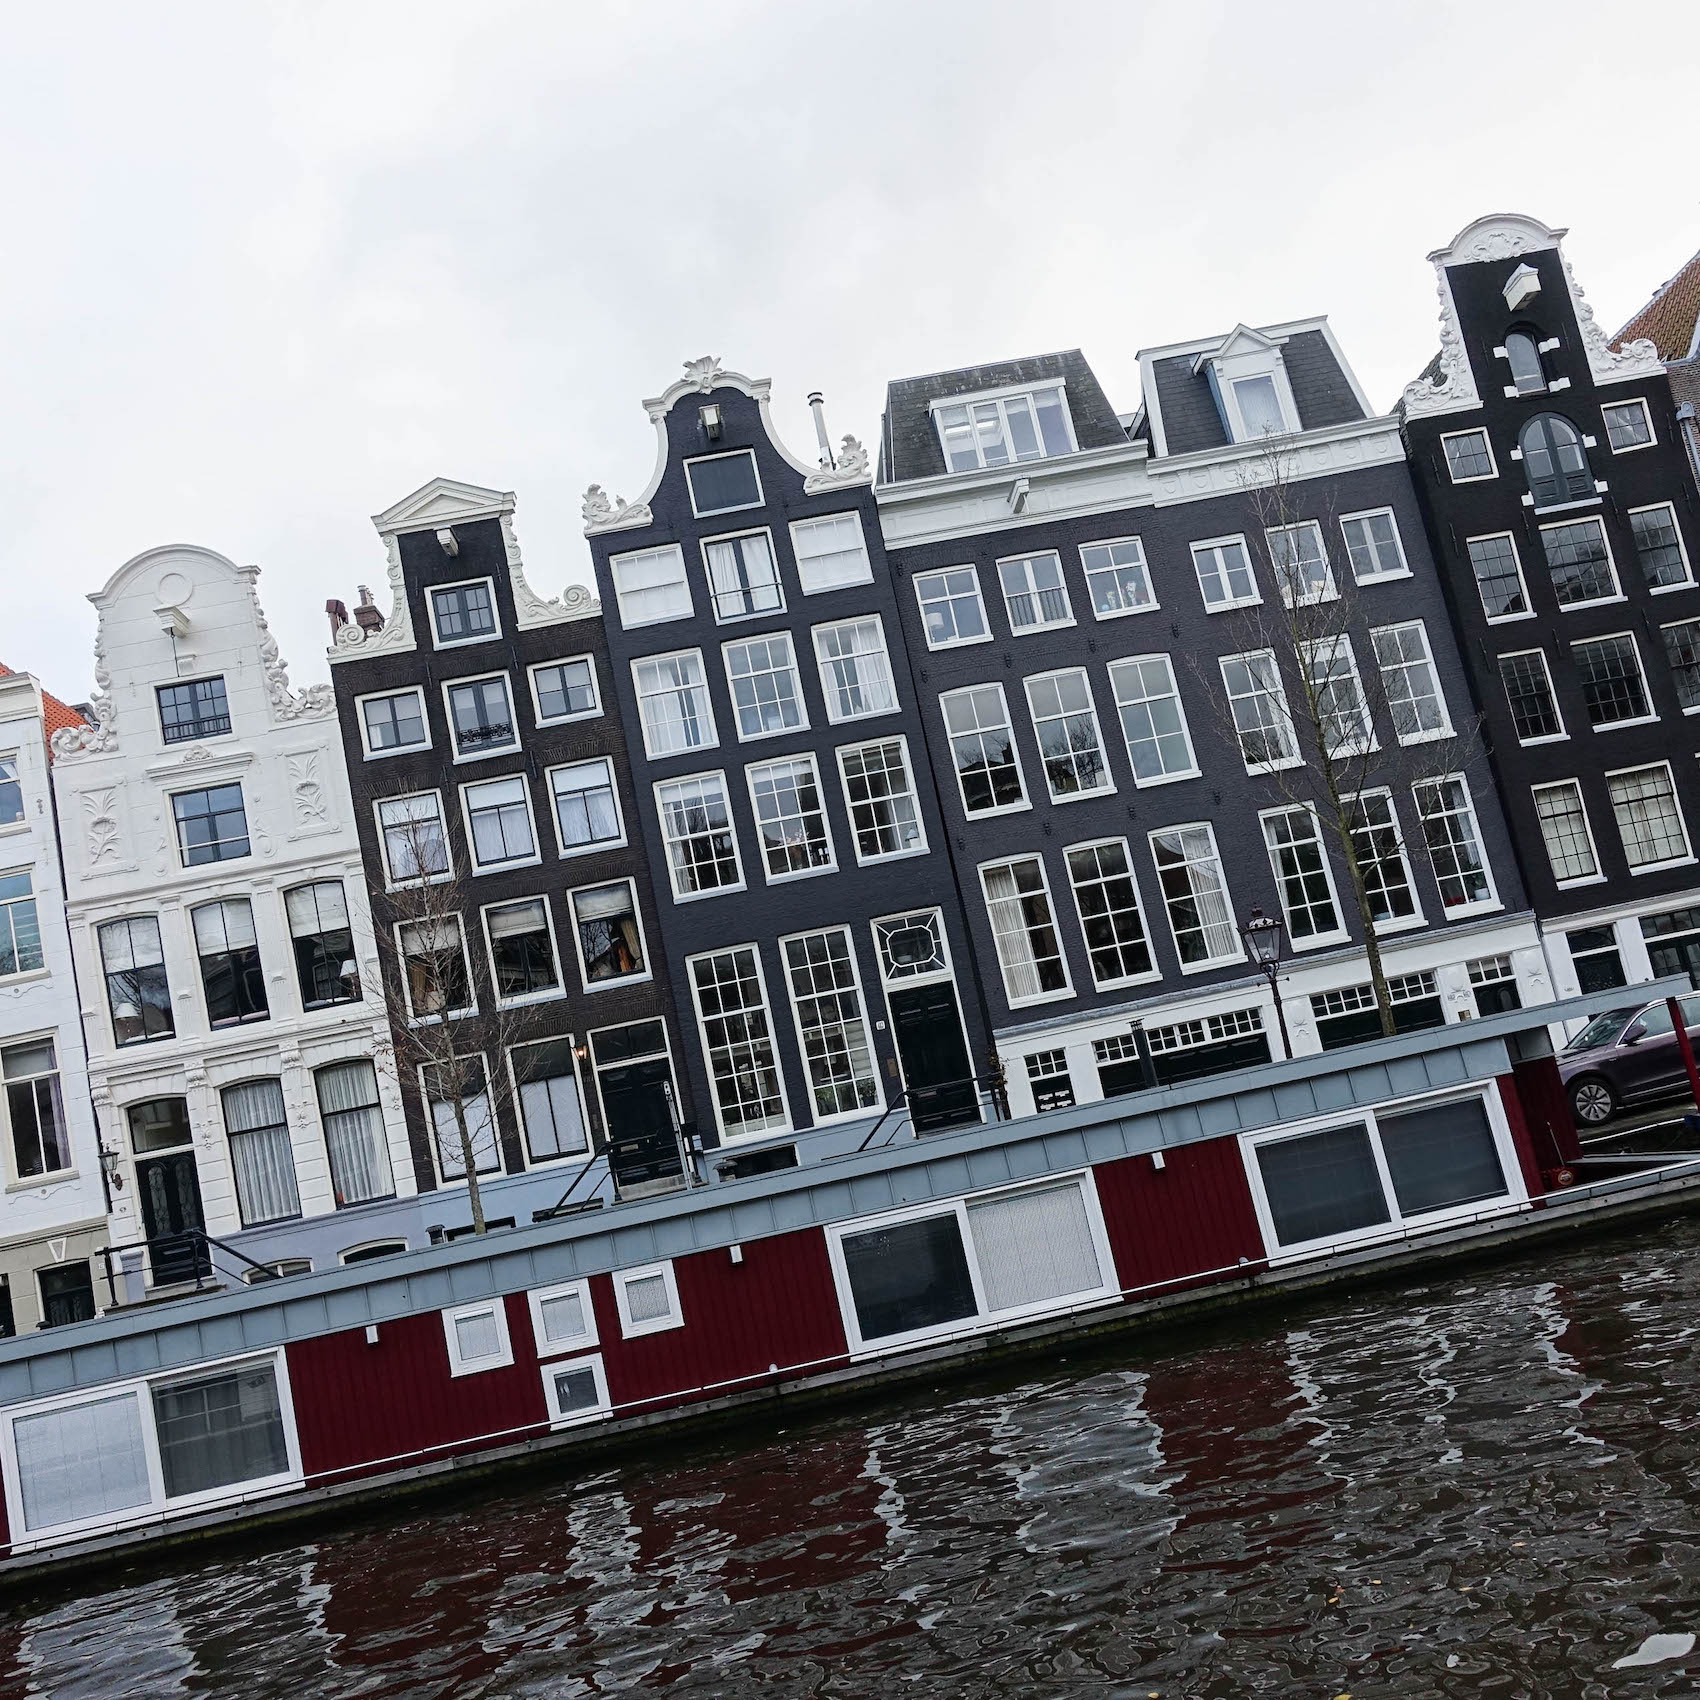 amsterdam-tipps suelovesnyc_sue_loves_nyc_susan_fengler_amsterdam_tipps_reise_blog_travel_blog_amsterdam_sightseeing